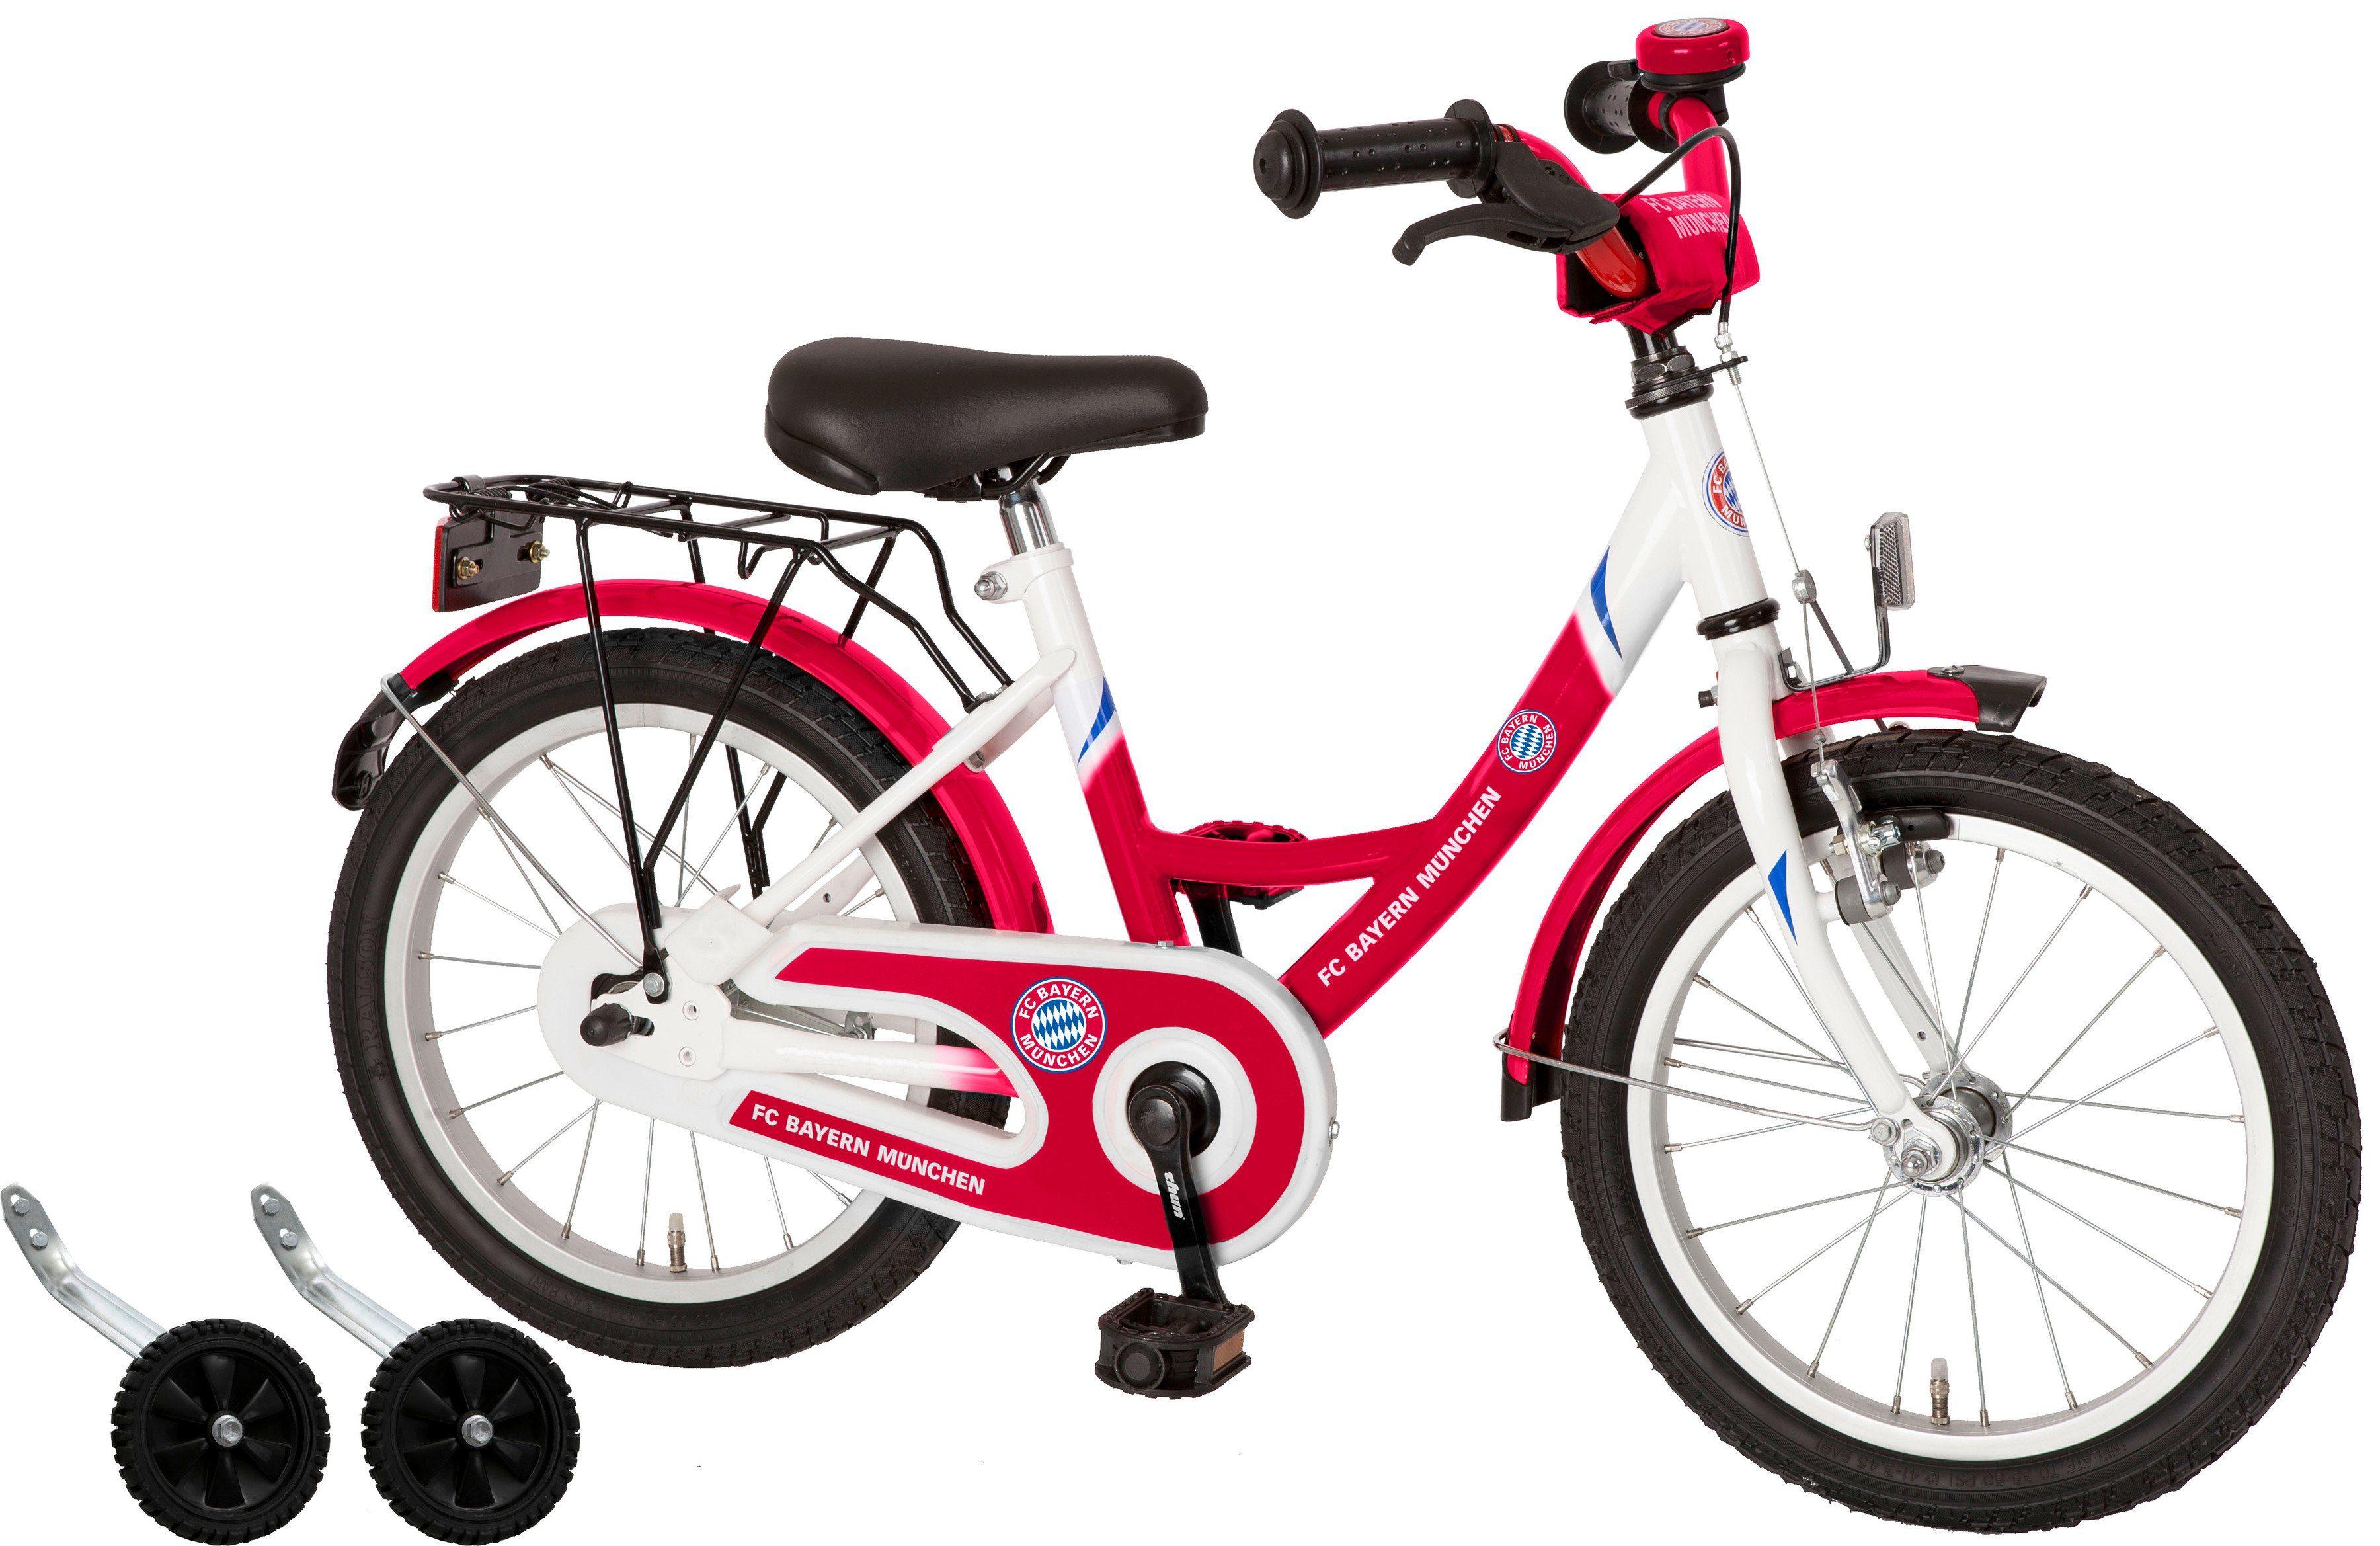 Cycles4Kids Kinderfahrrad »Bayern München, 40,64 cm (16 Zoll)«